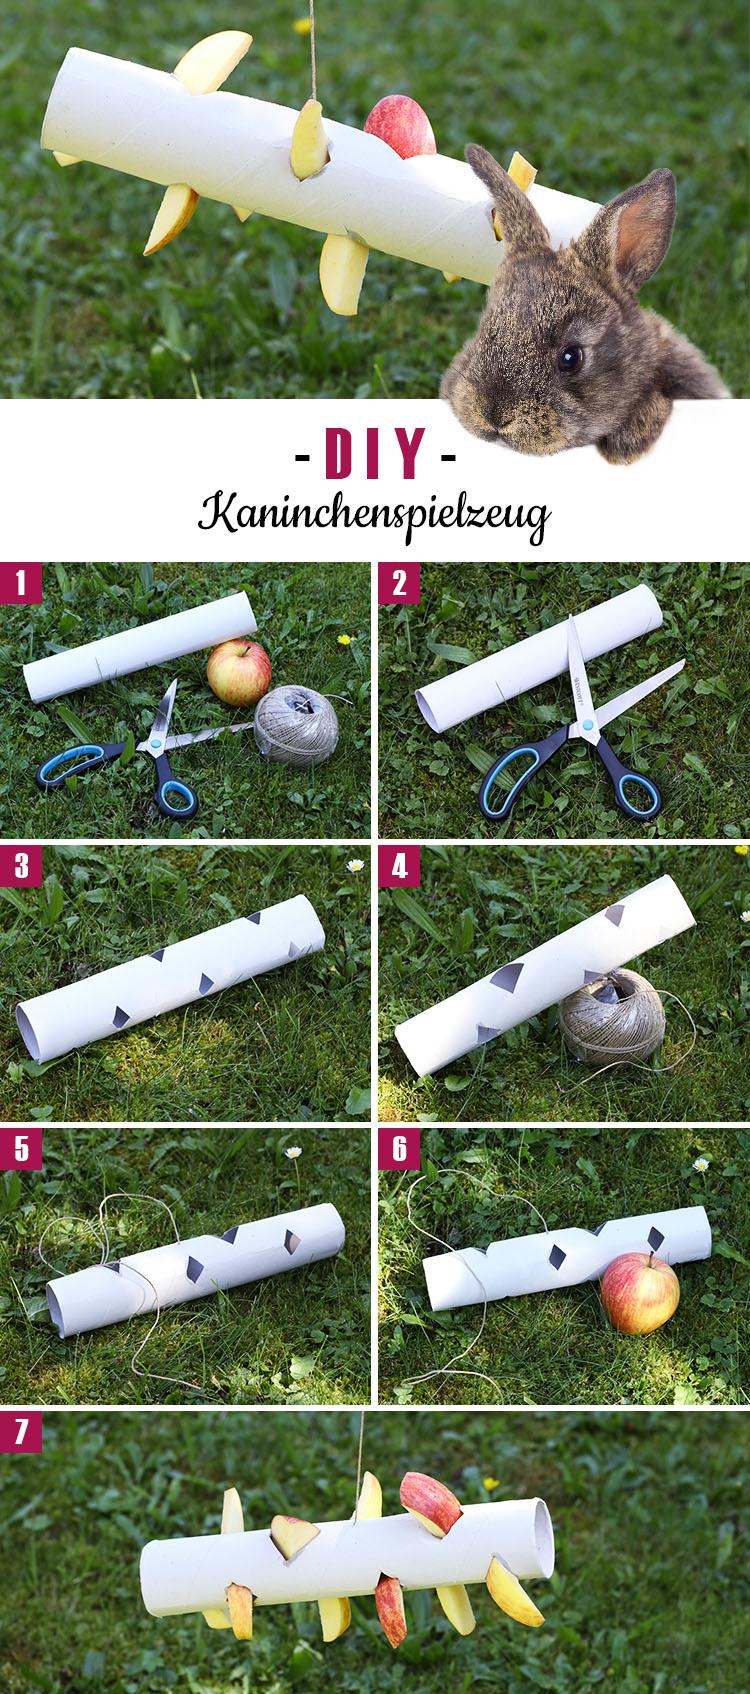 DIY: Kaninchenspielzeug selber basteln